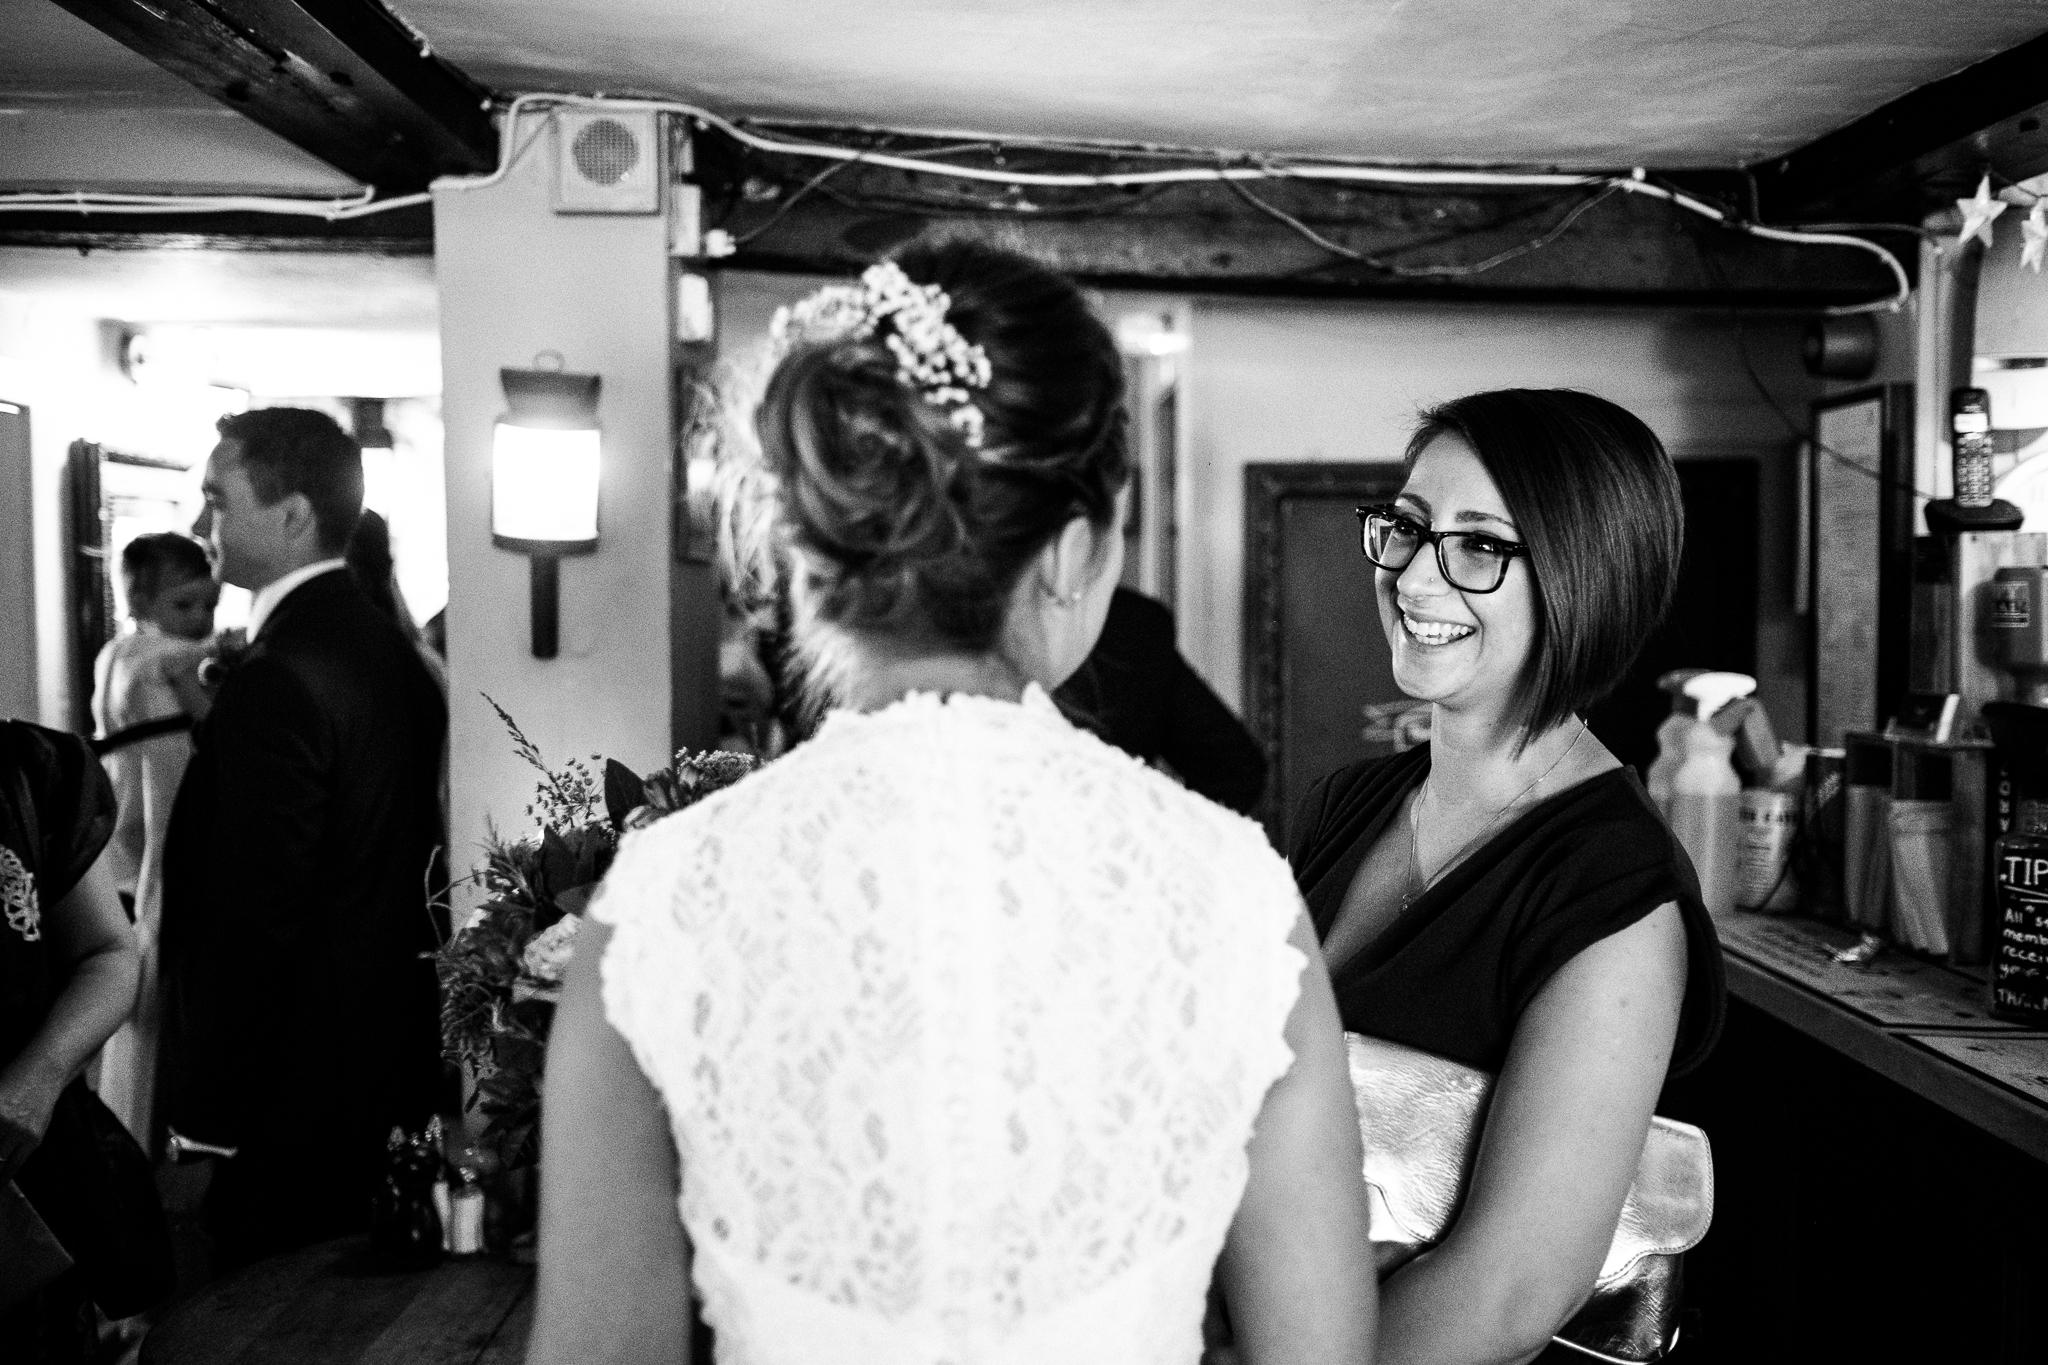 Relaxed Documentary Wedding Photography at The Wizard Inn, Alderley Edge Cheshire - Jenny Harper-37.jpg